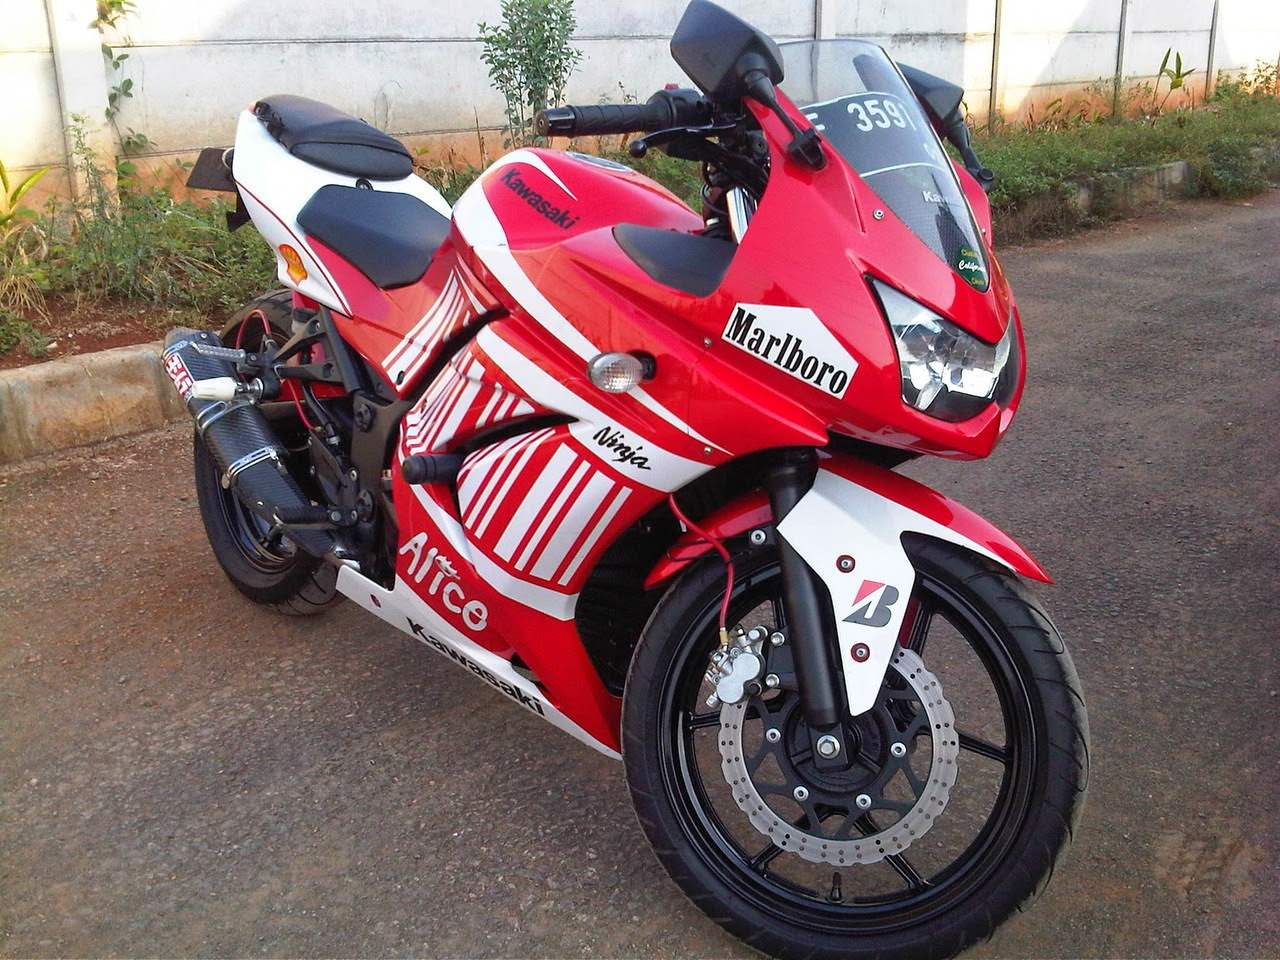 Modifikasi Motor Kawasaki Ninja 250 Warna Merah